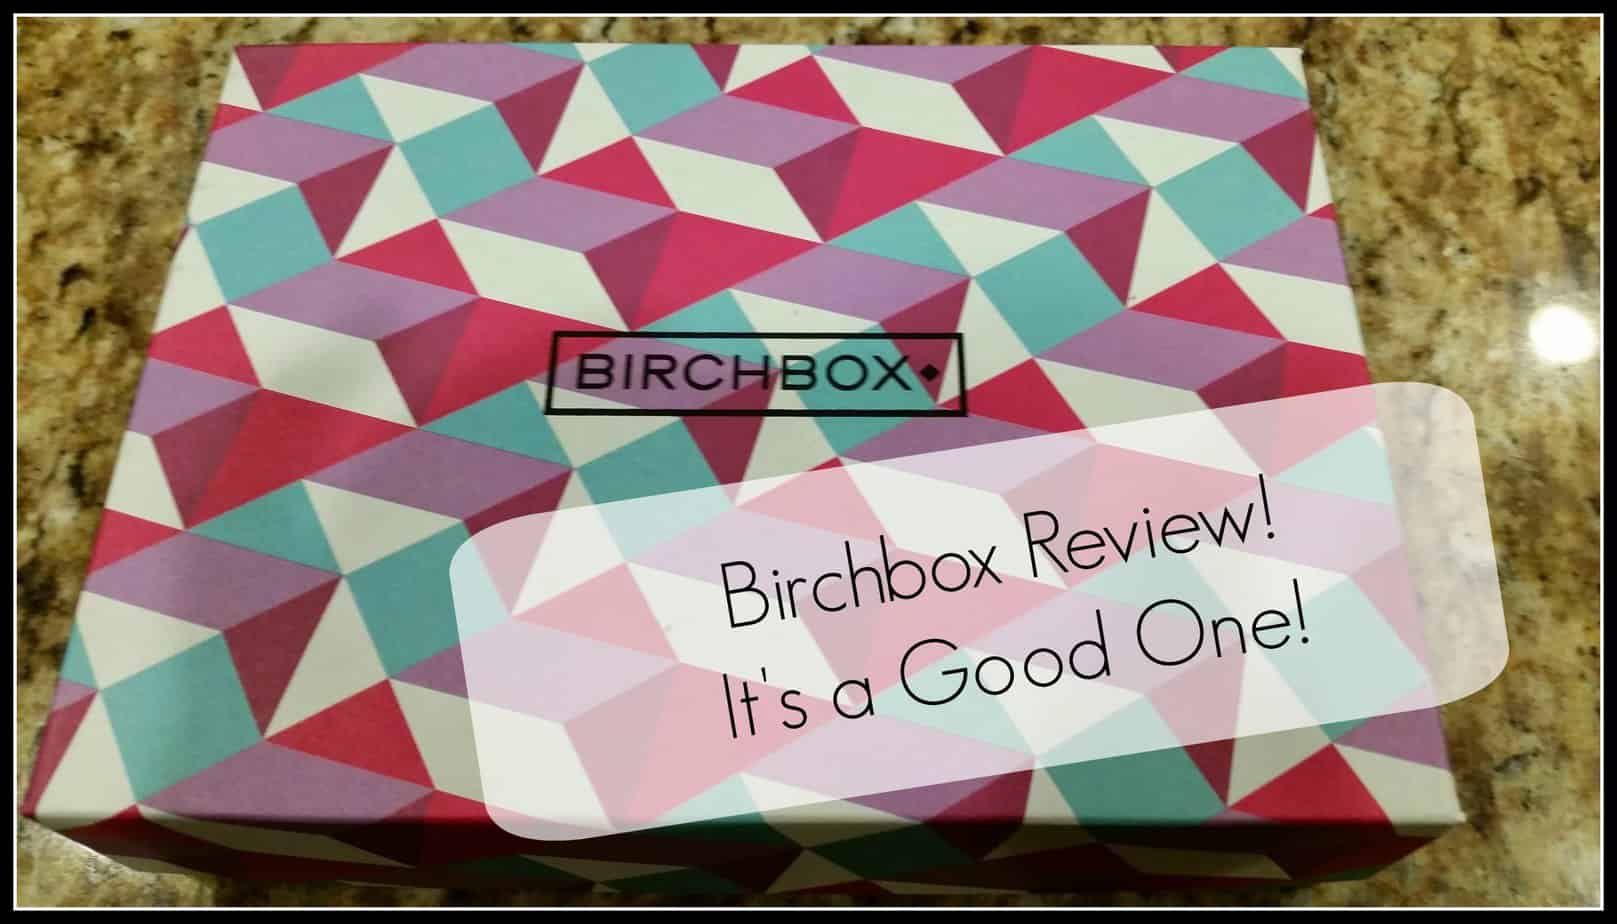 Birchbox Review!